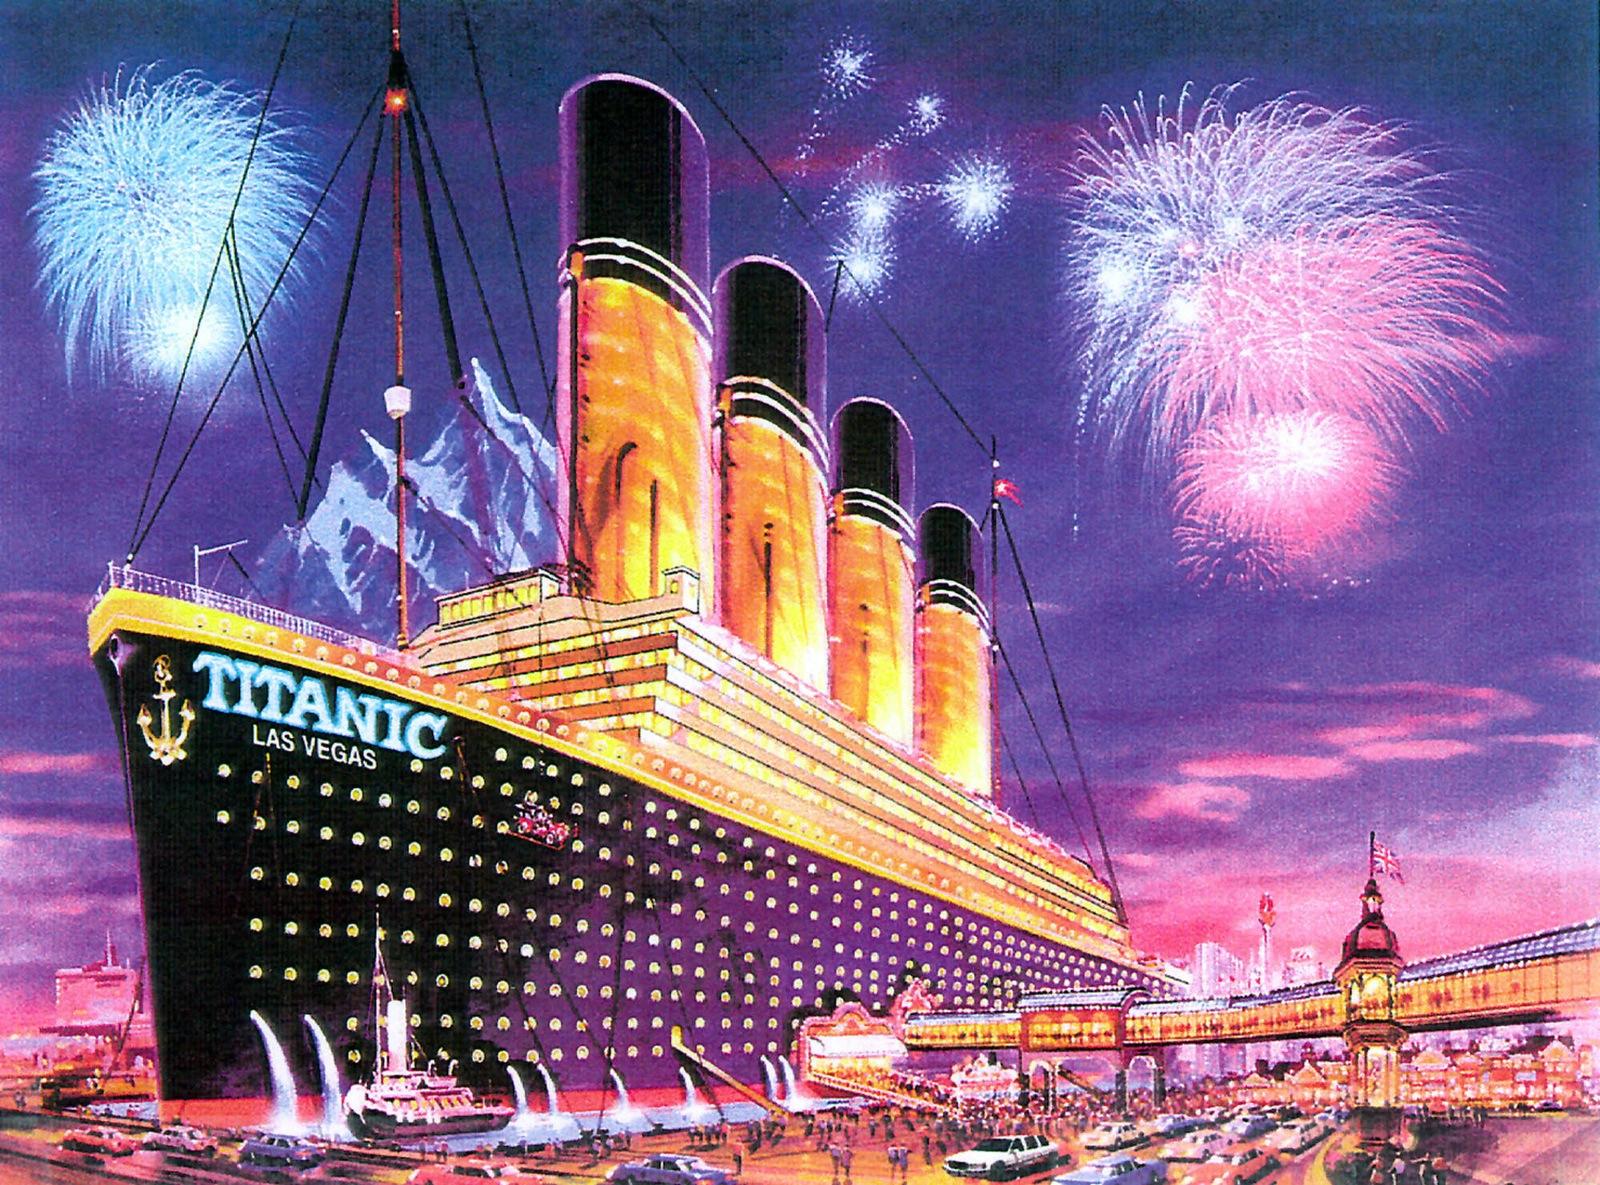 Titanic casino las casino palm beach cannes poker